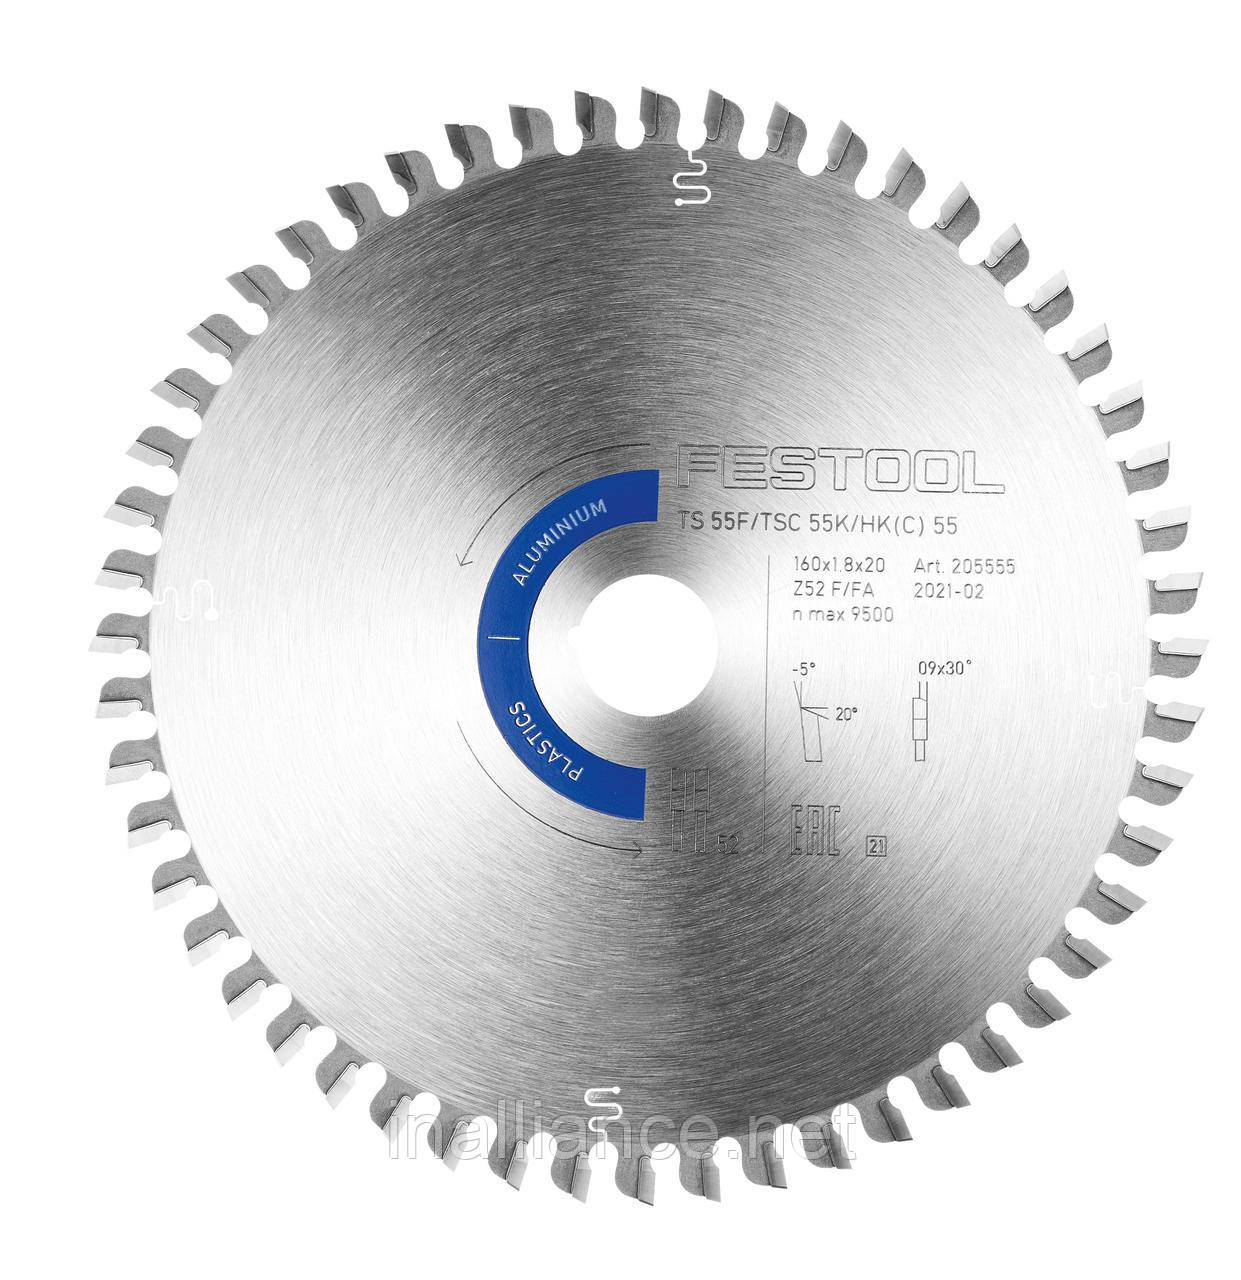 Пиляльний диск ALUMINIUM / PLASTICS HW 160 x1,8 x 20 F/FA52 Festool 205555